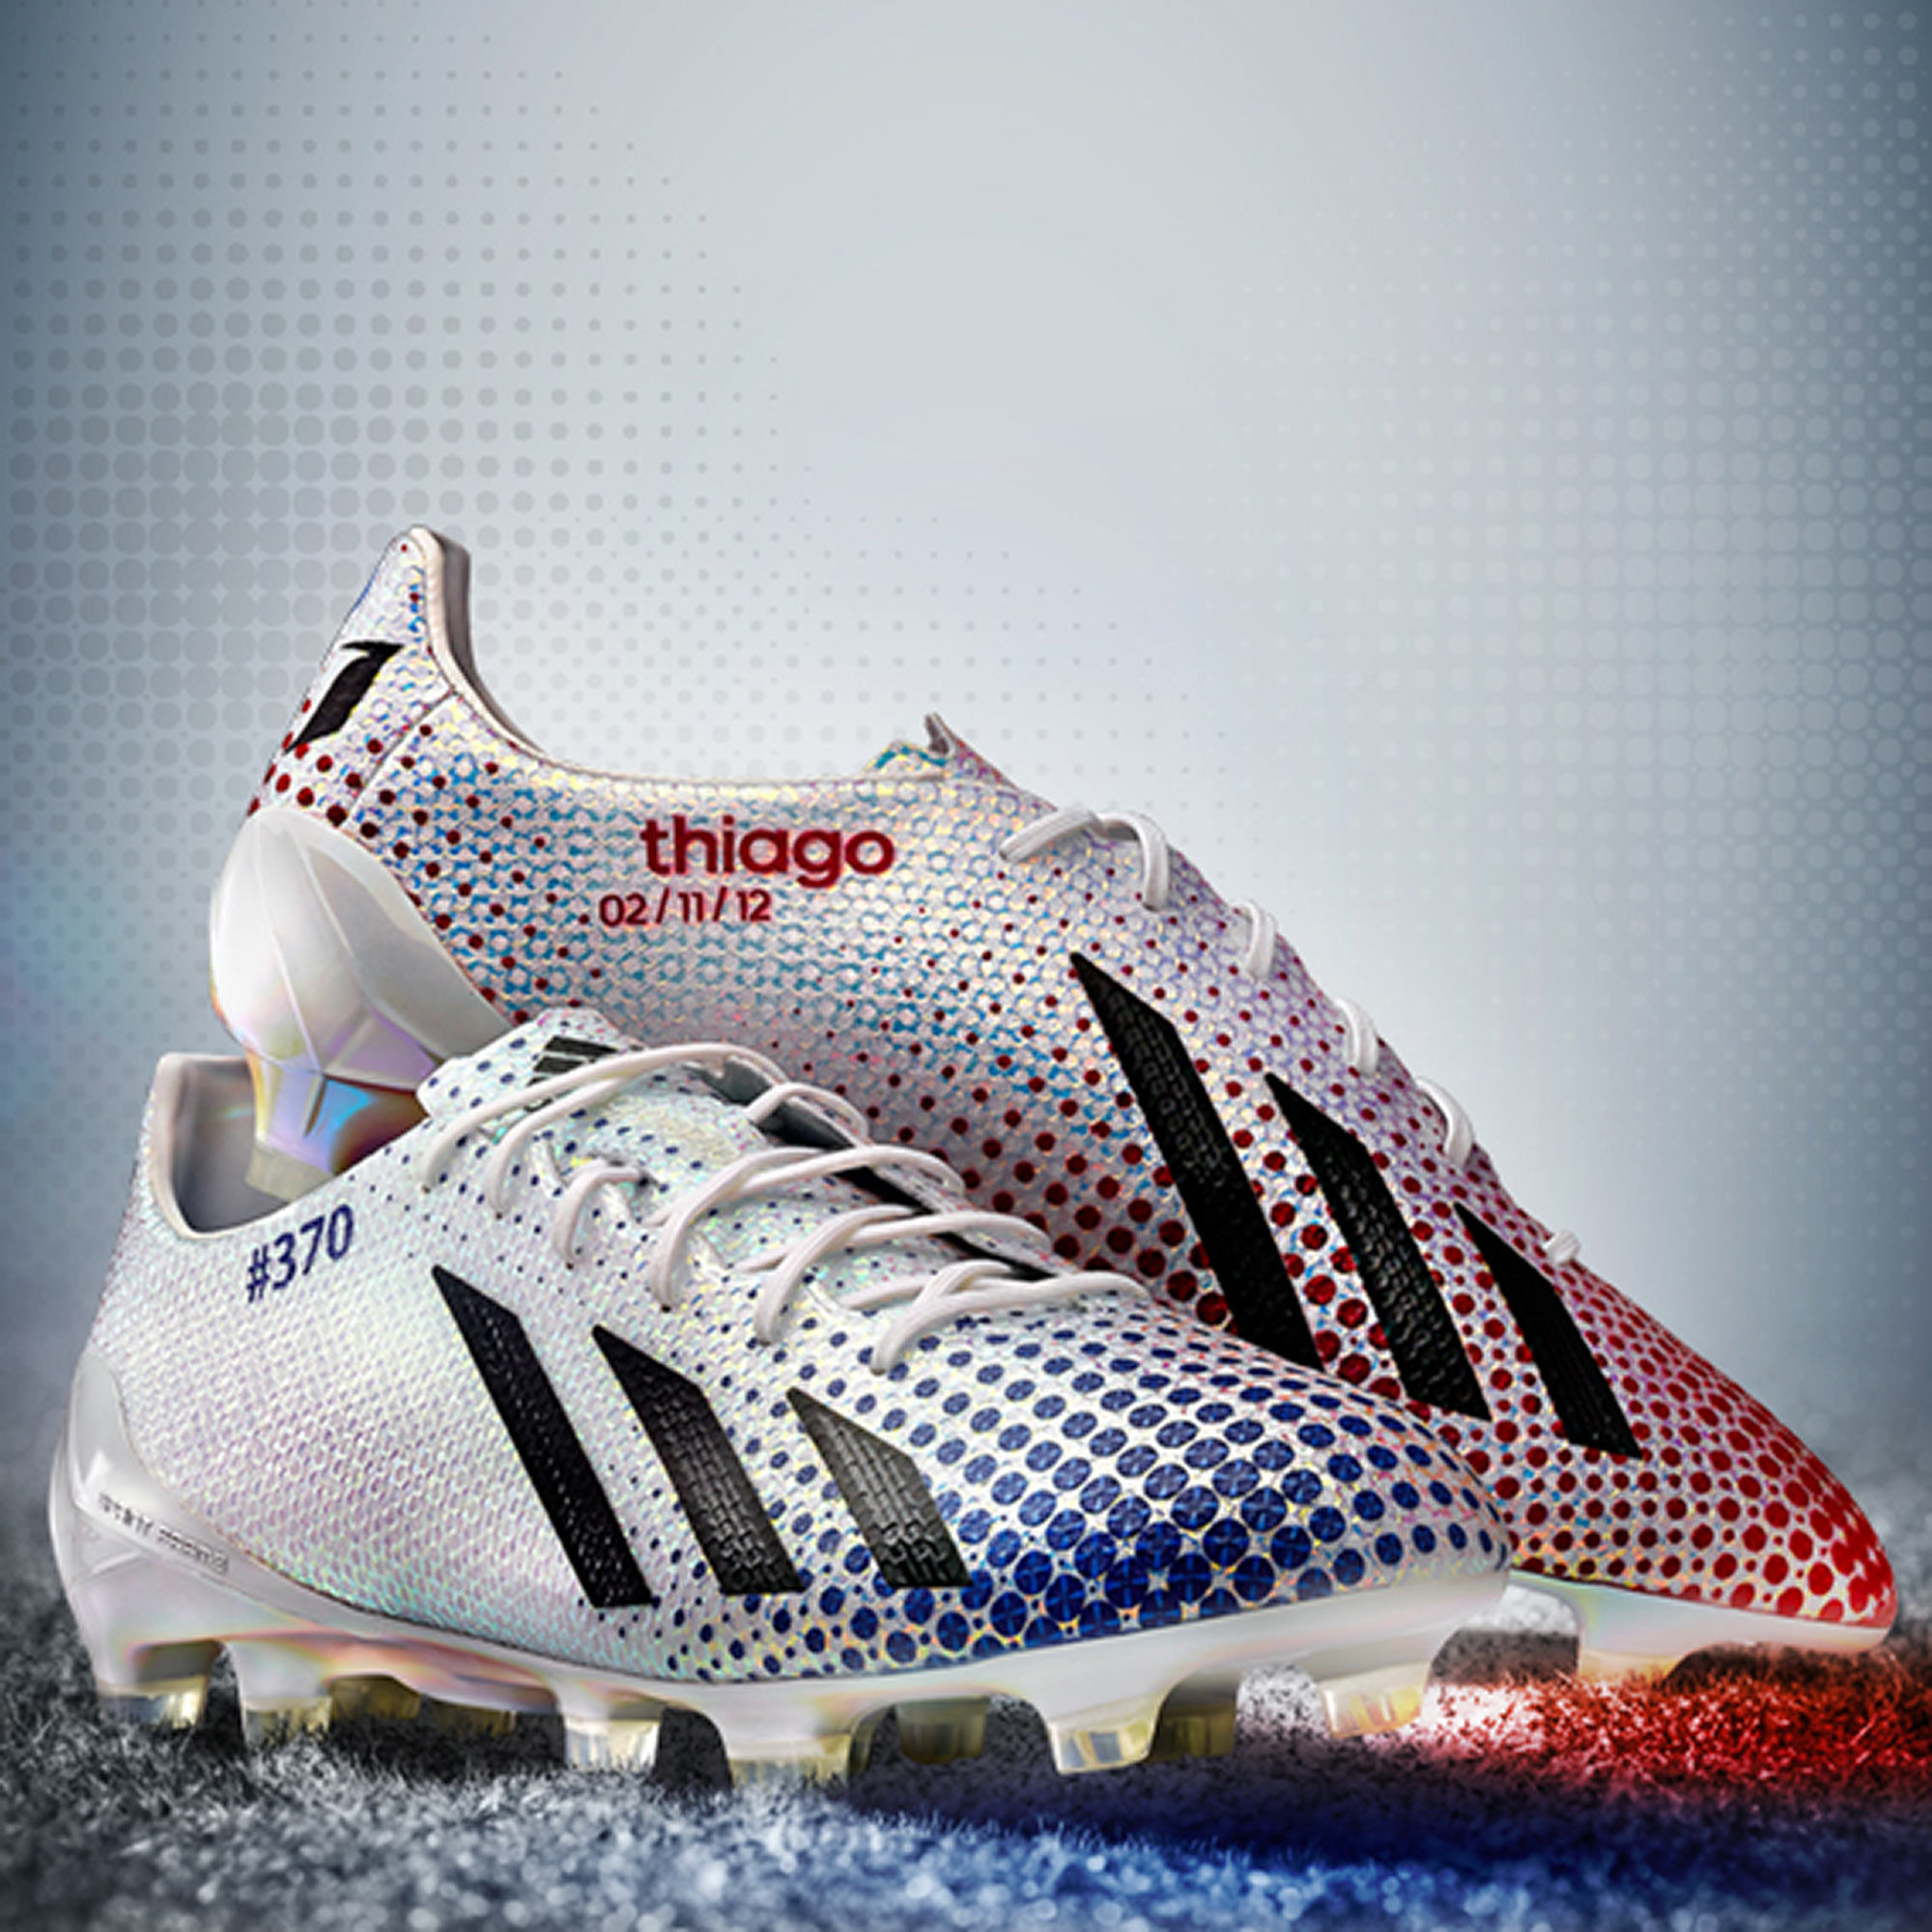 Adidas adizero F50 TRX FG Messi 370